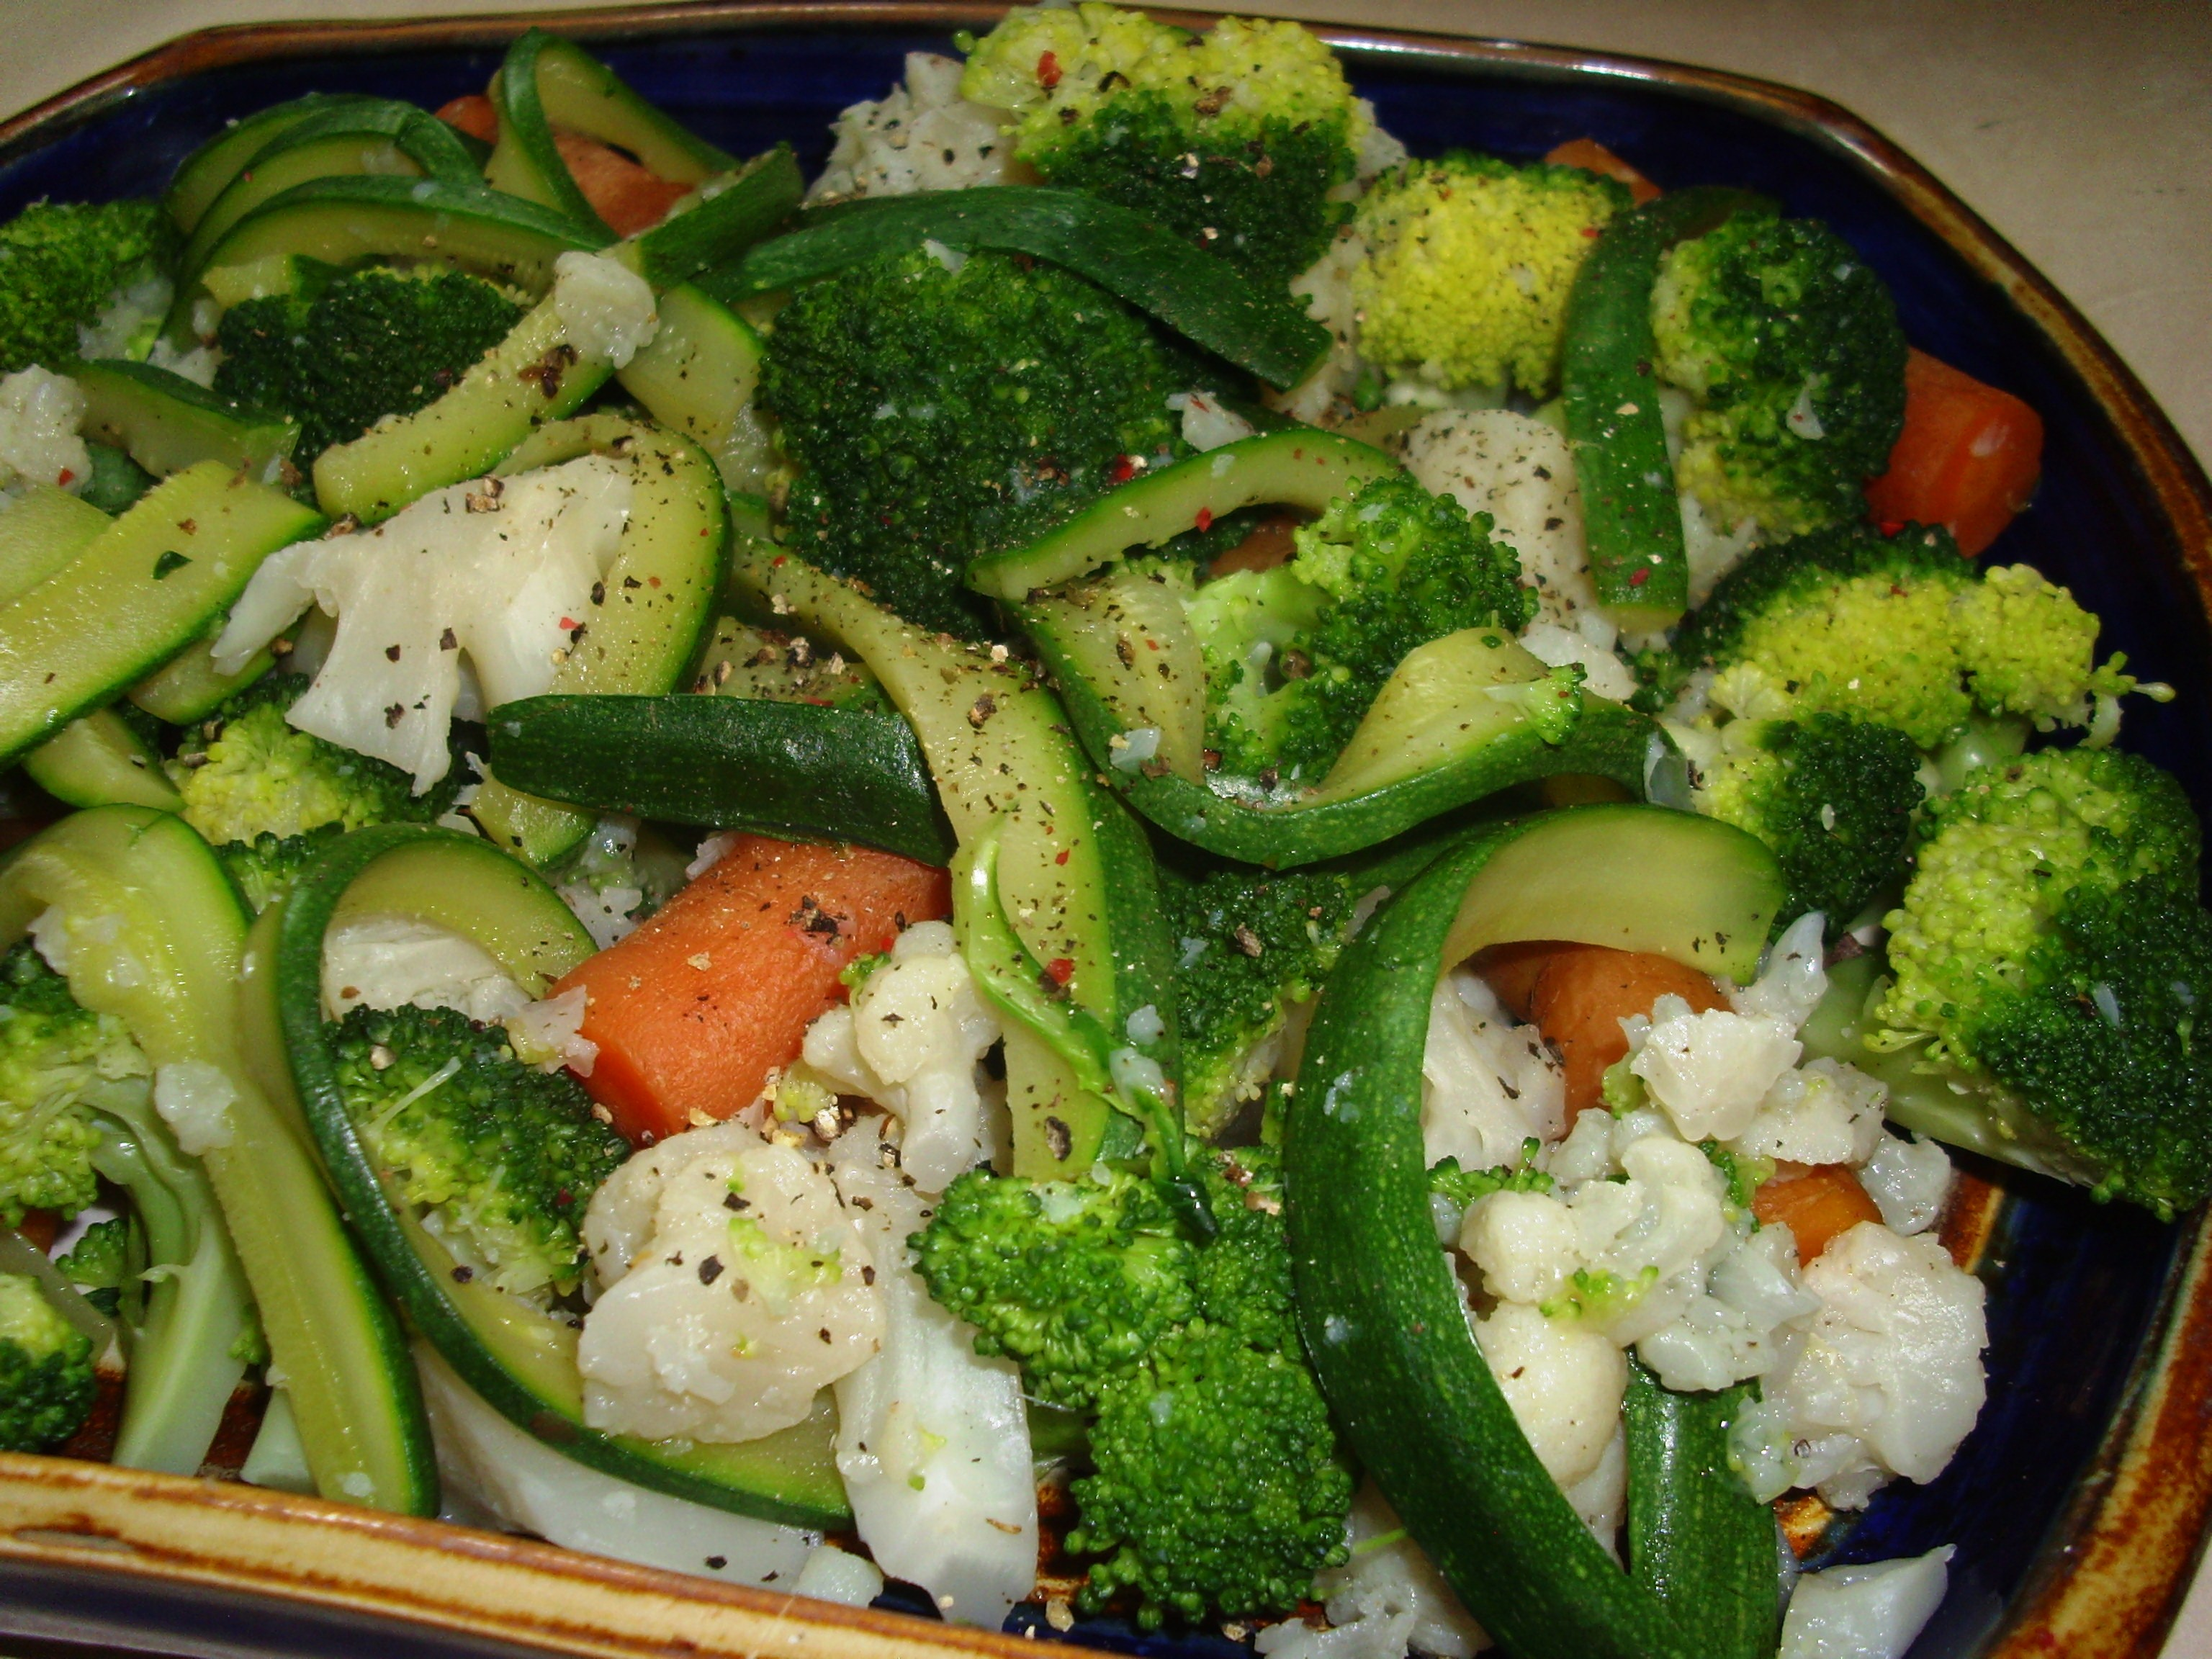 Steamed vegetables recipes genius kitchen forumfinder Choice Image